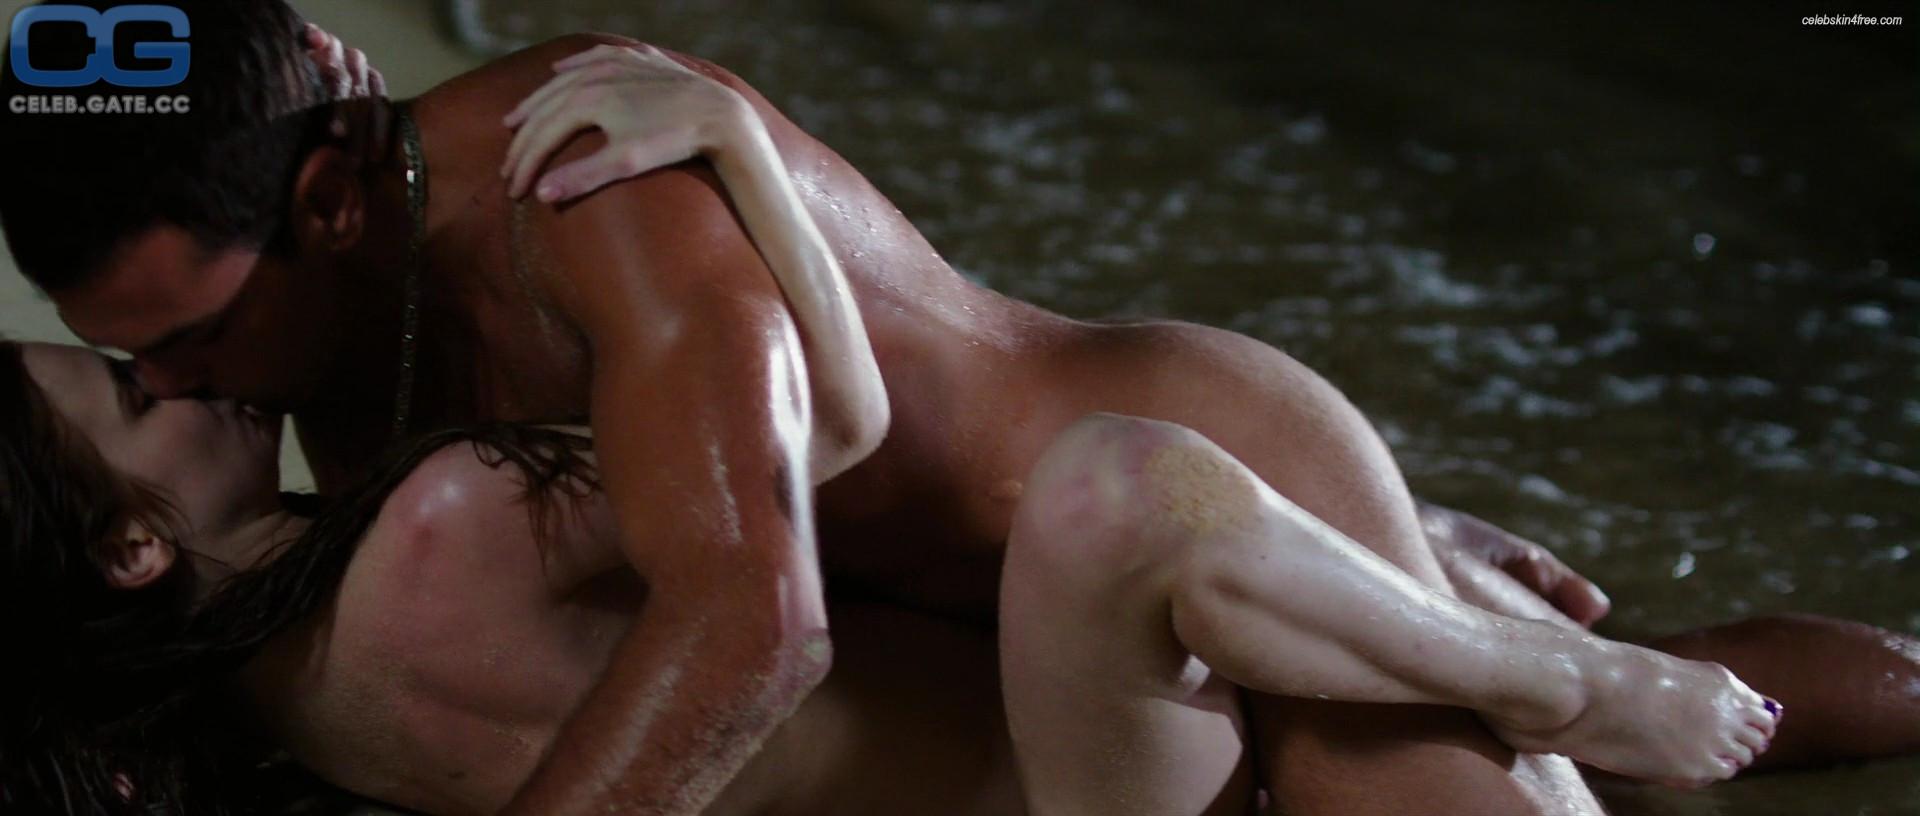 Preuß nacktbilder josefine ᐉ Nackt